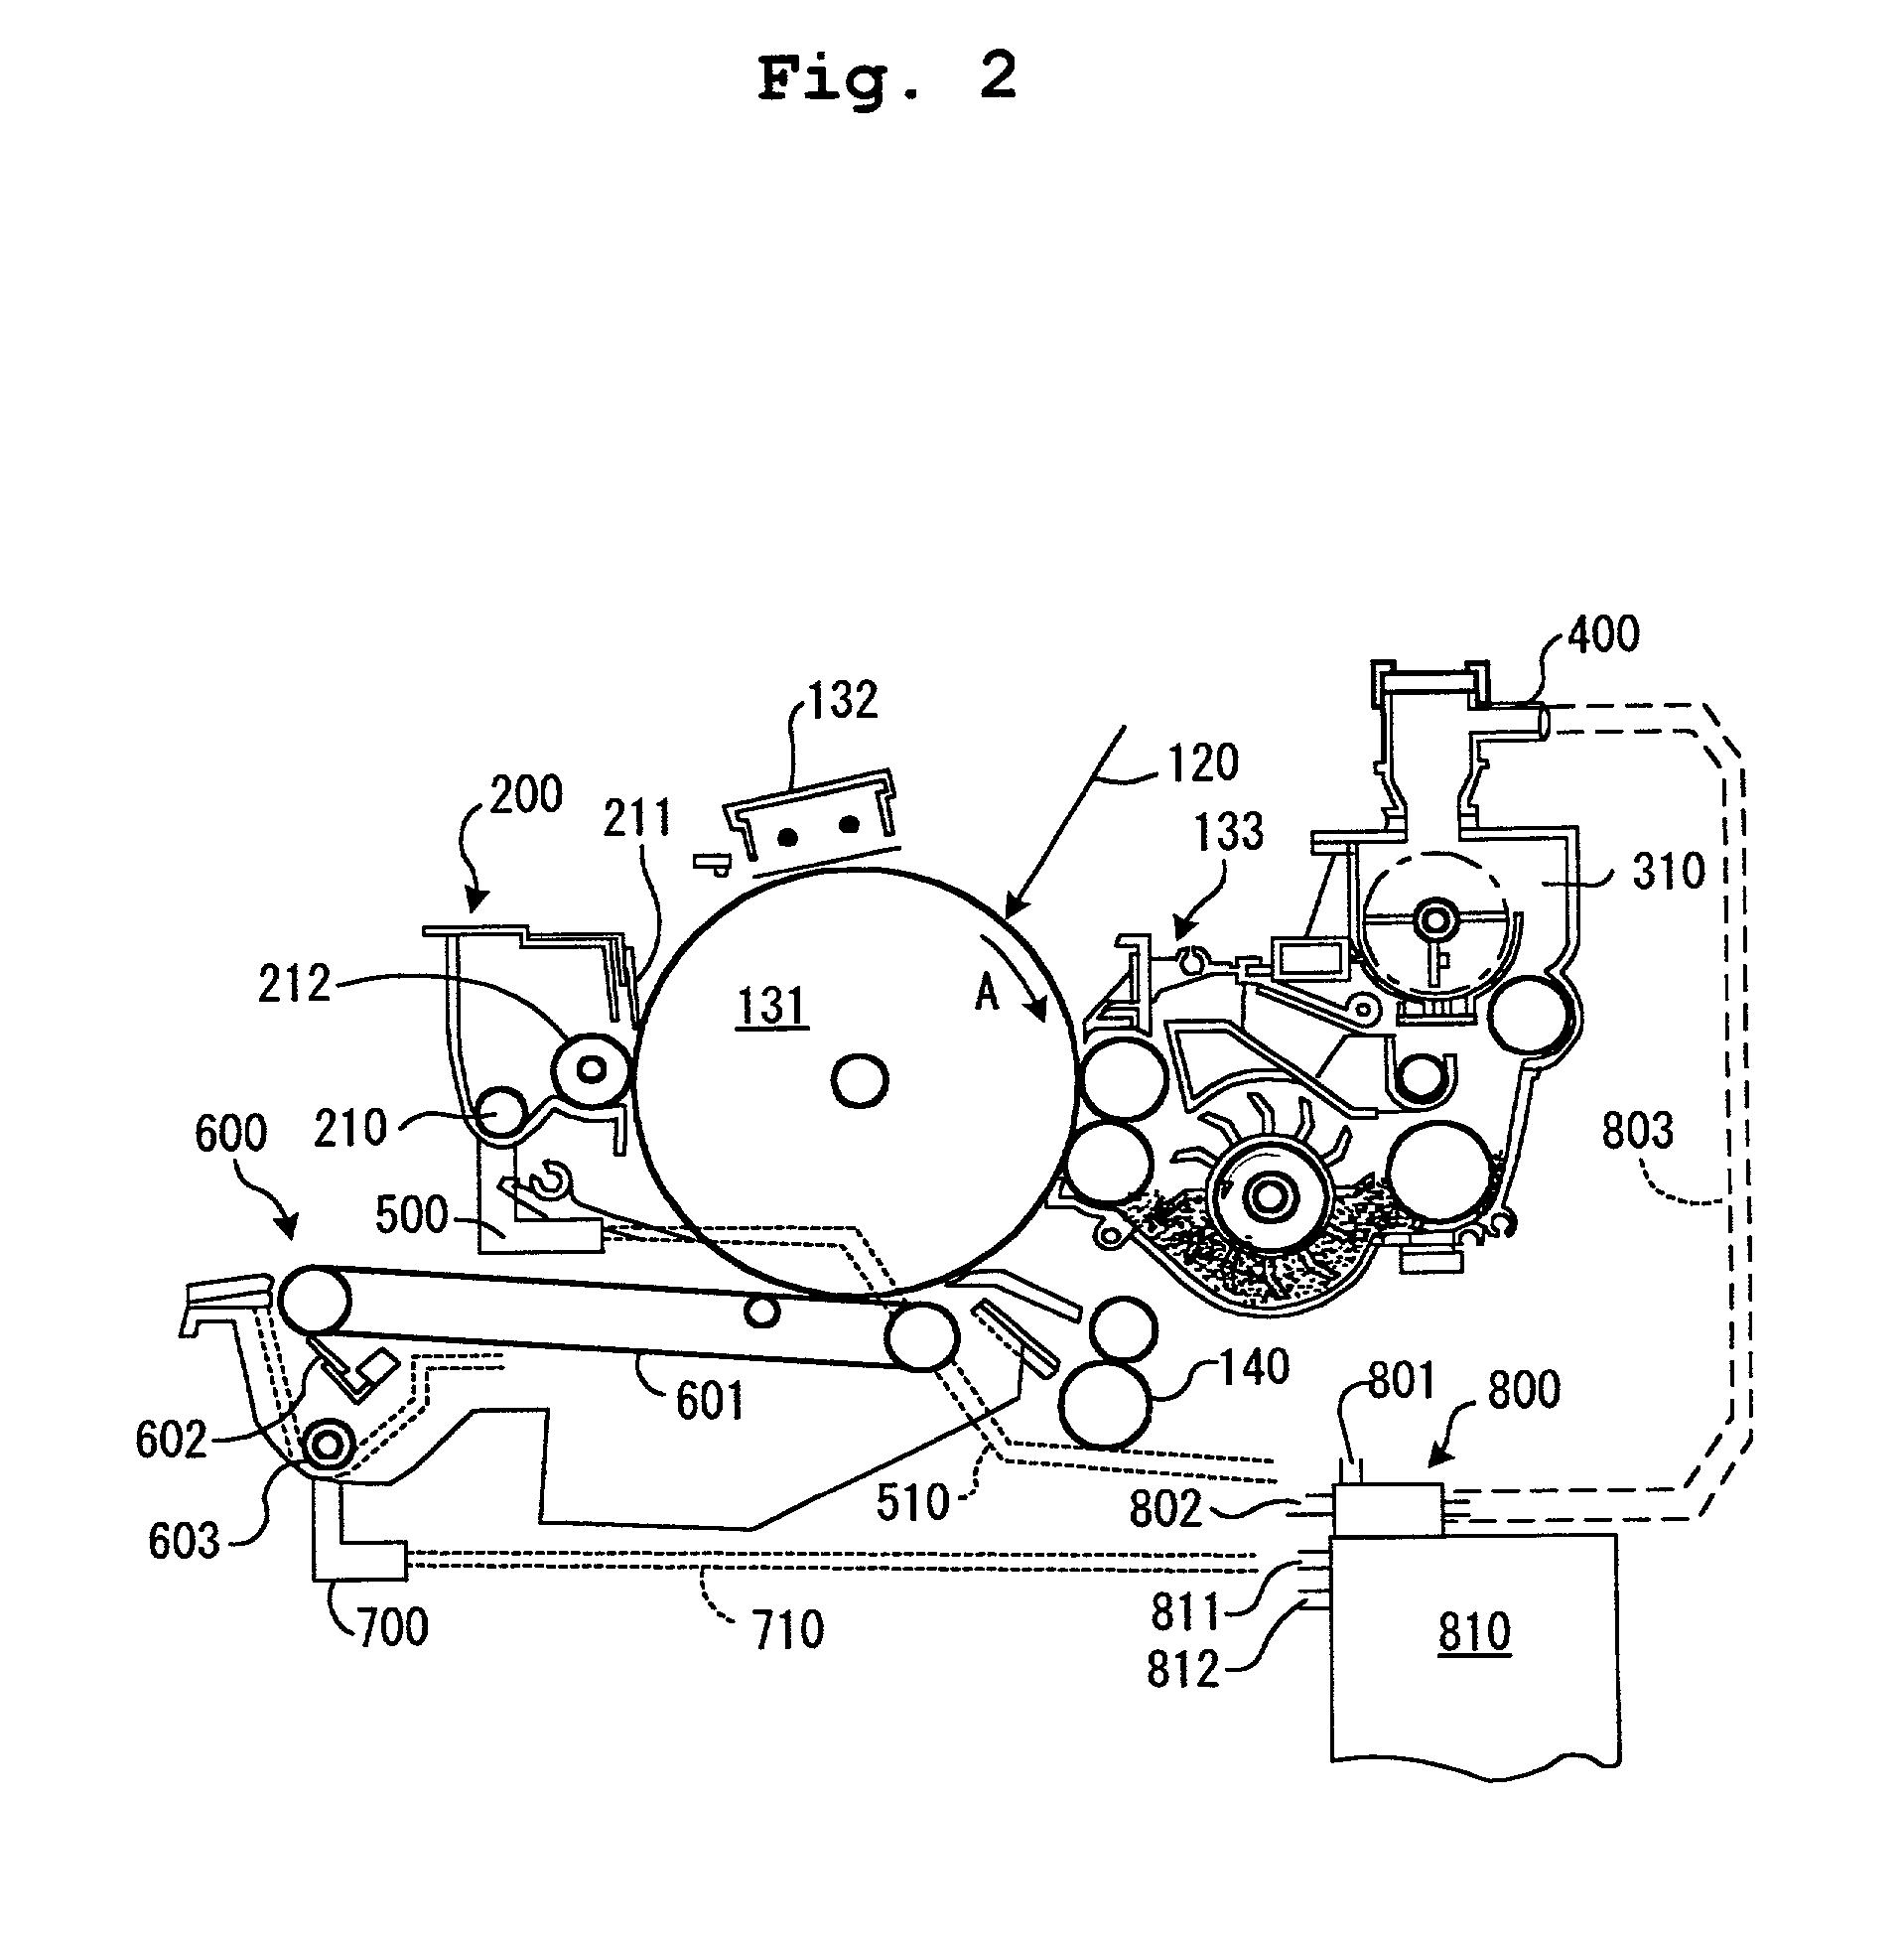 Diagram Wiring Older Diagram Furnace 90 06furnace